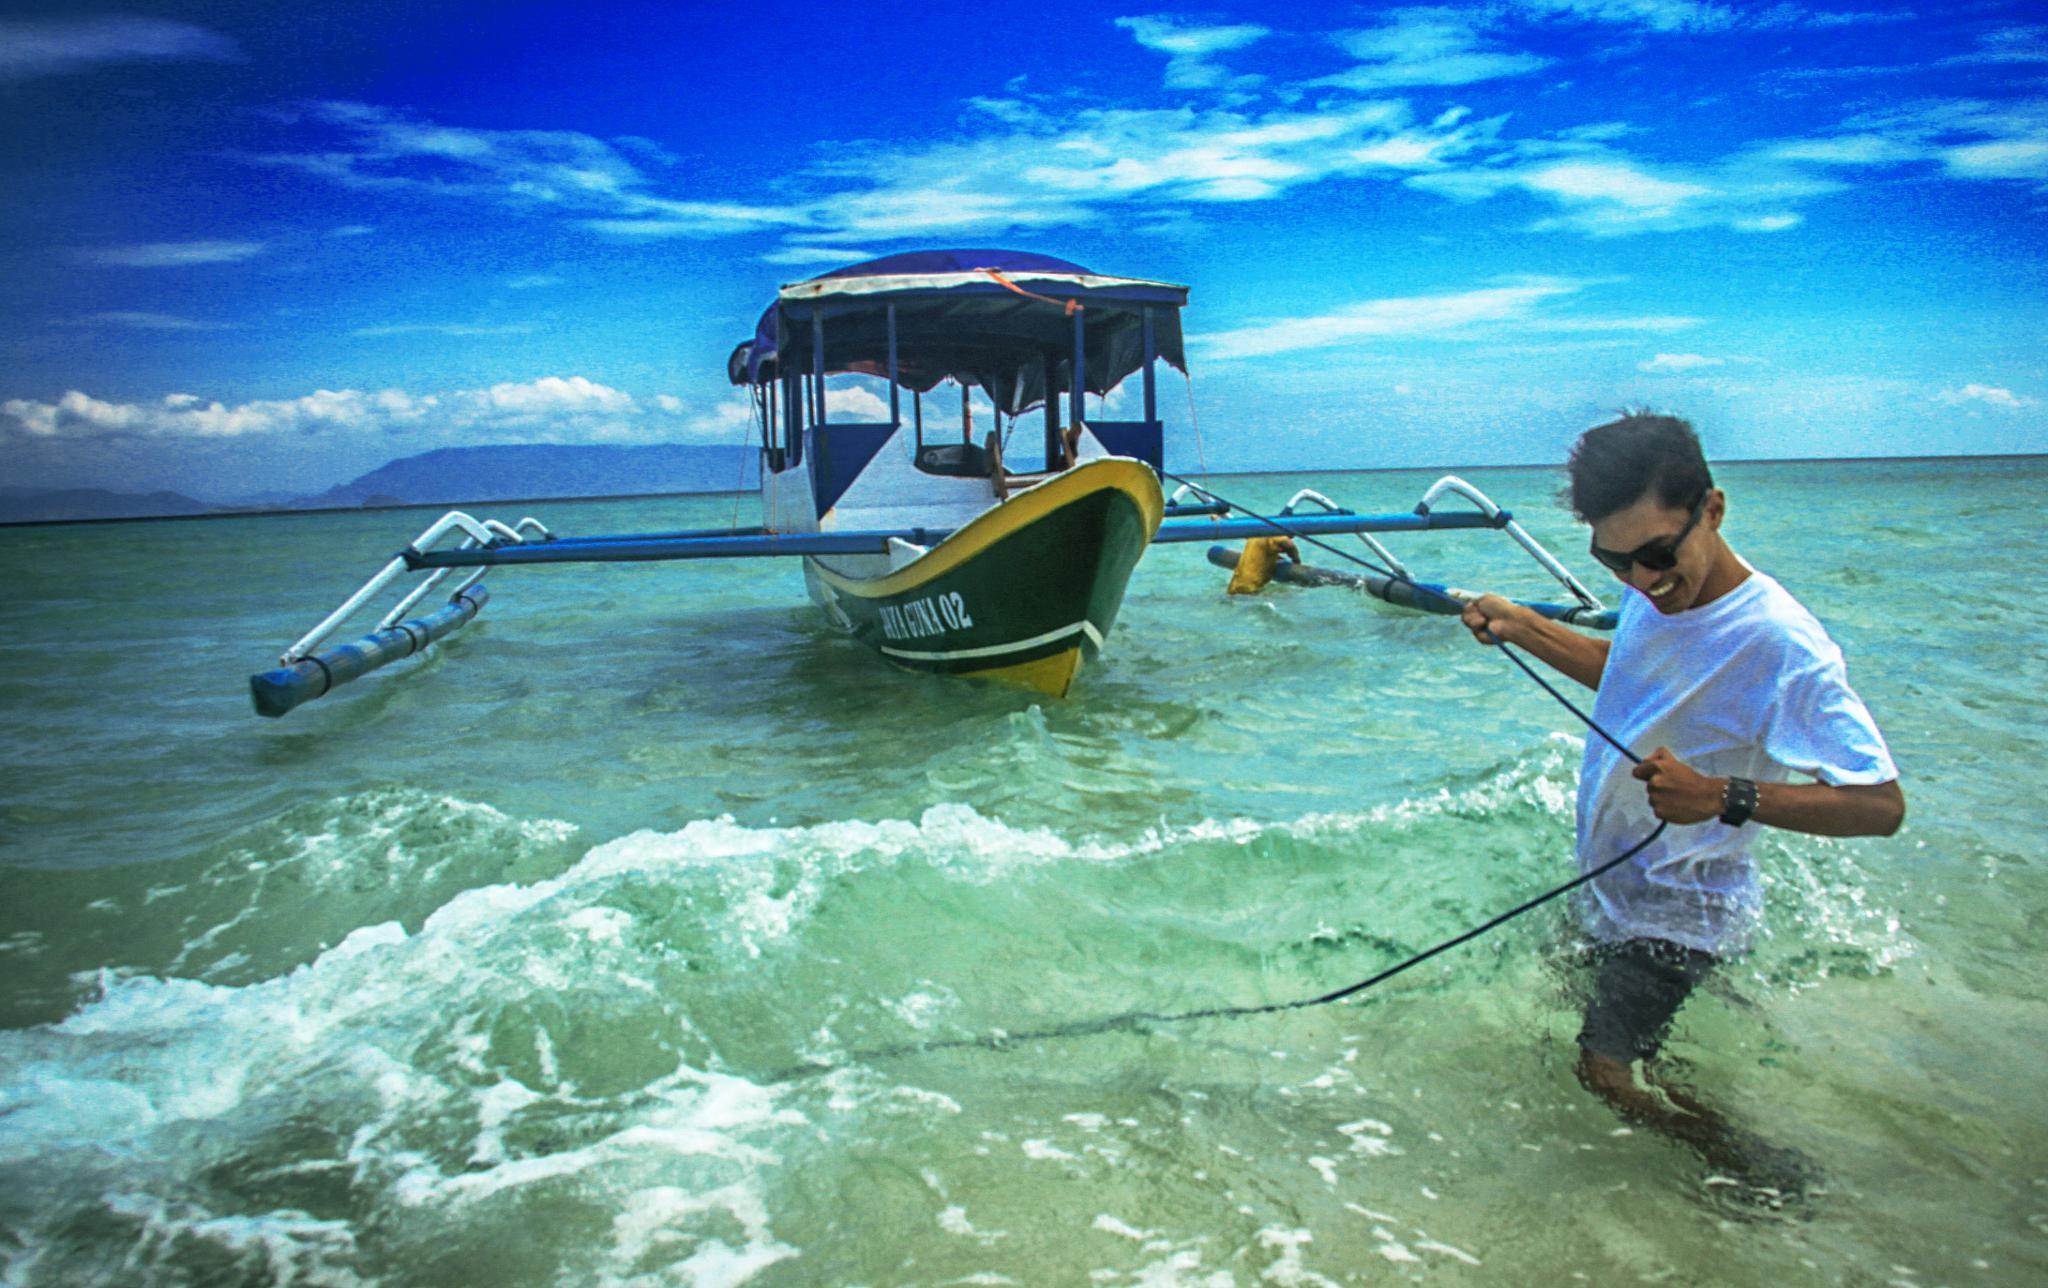 GILI KAPAL LOMBOK ISLAND INDONESIA by abhiechitroredjo